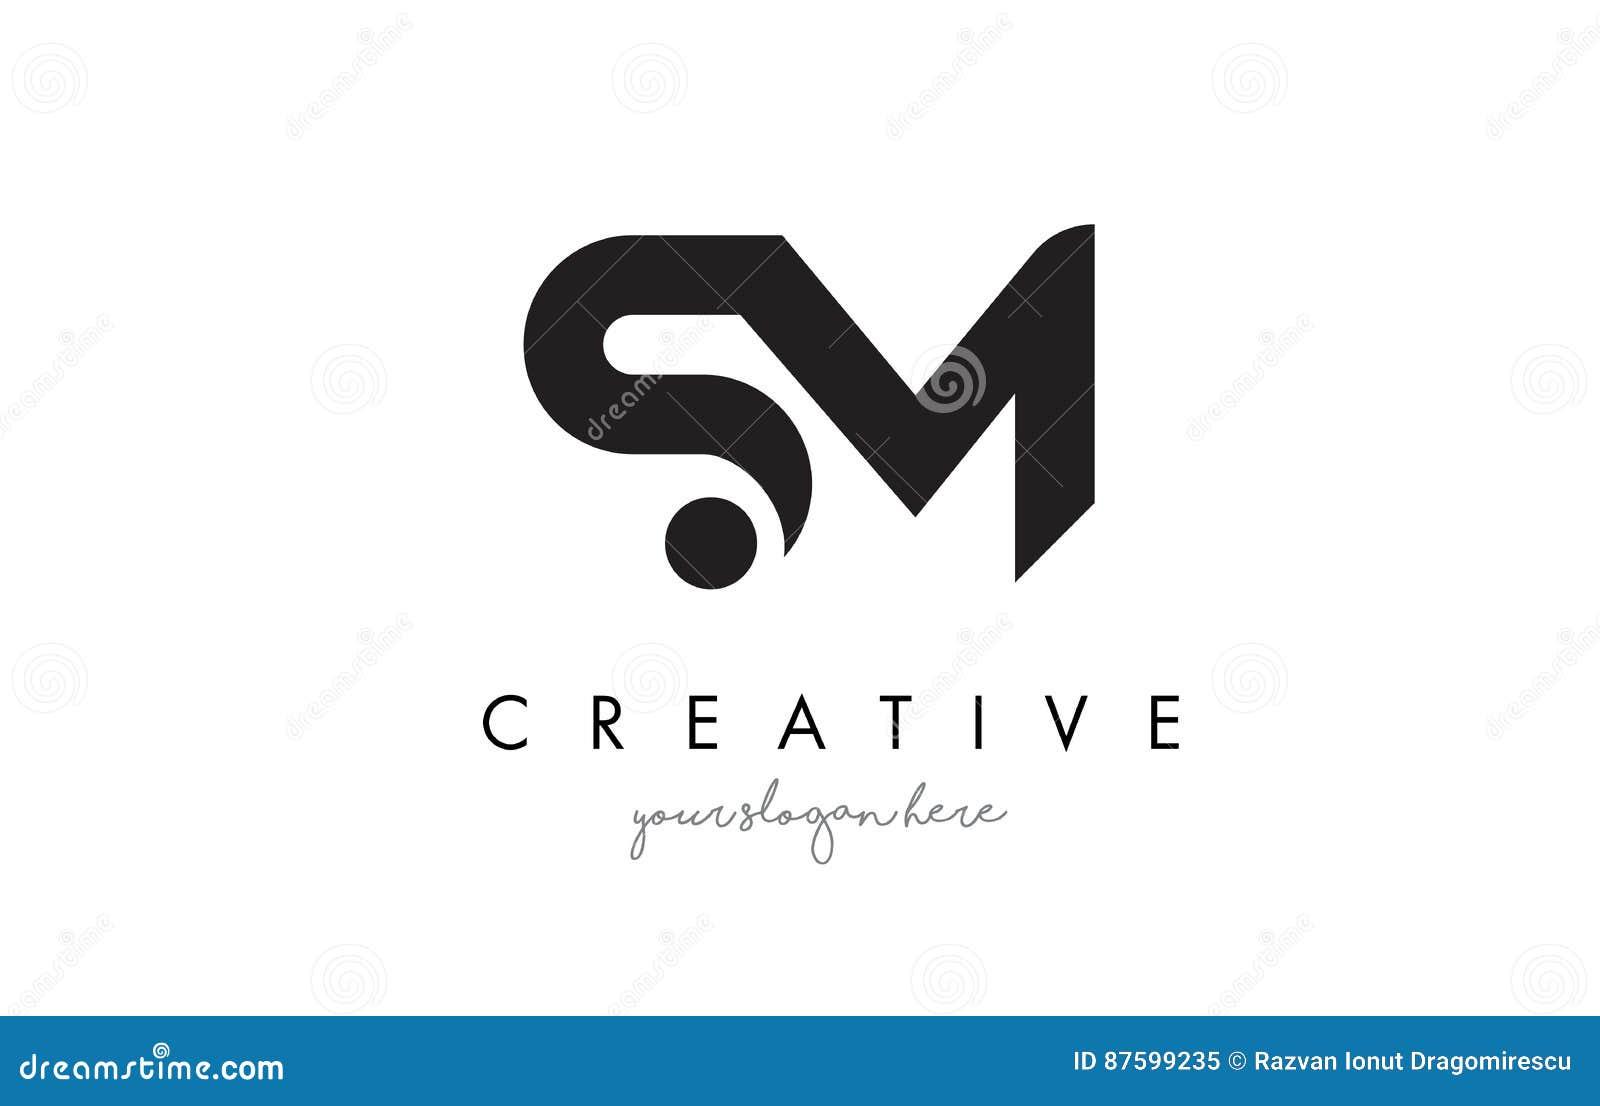 Sm Letter Logo Design With Creative Modern Trendy